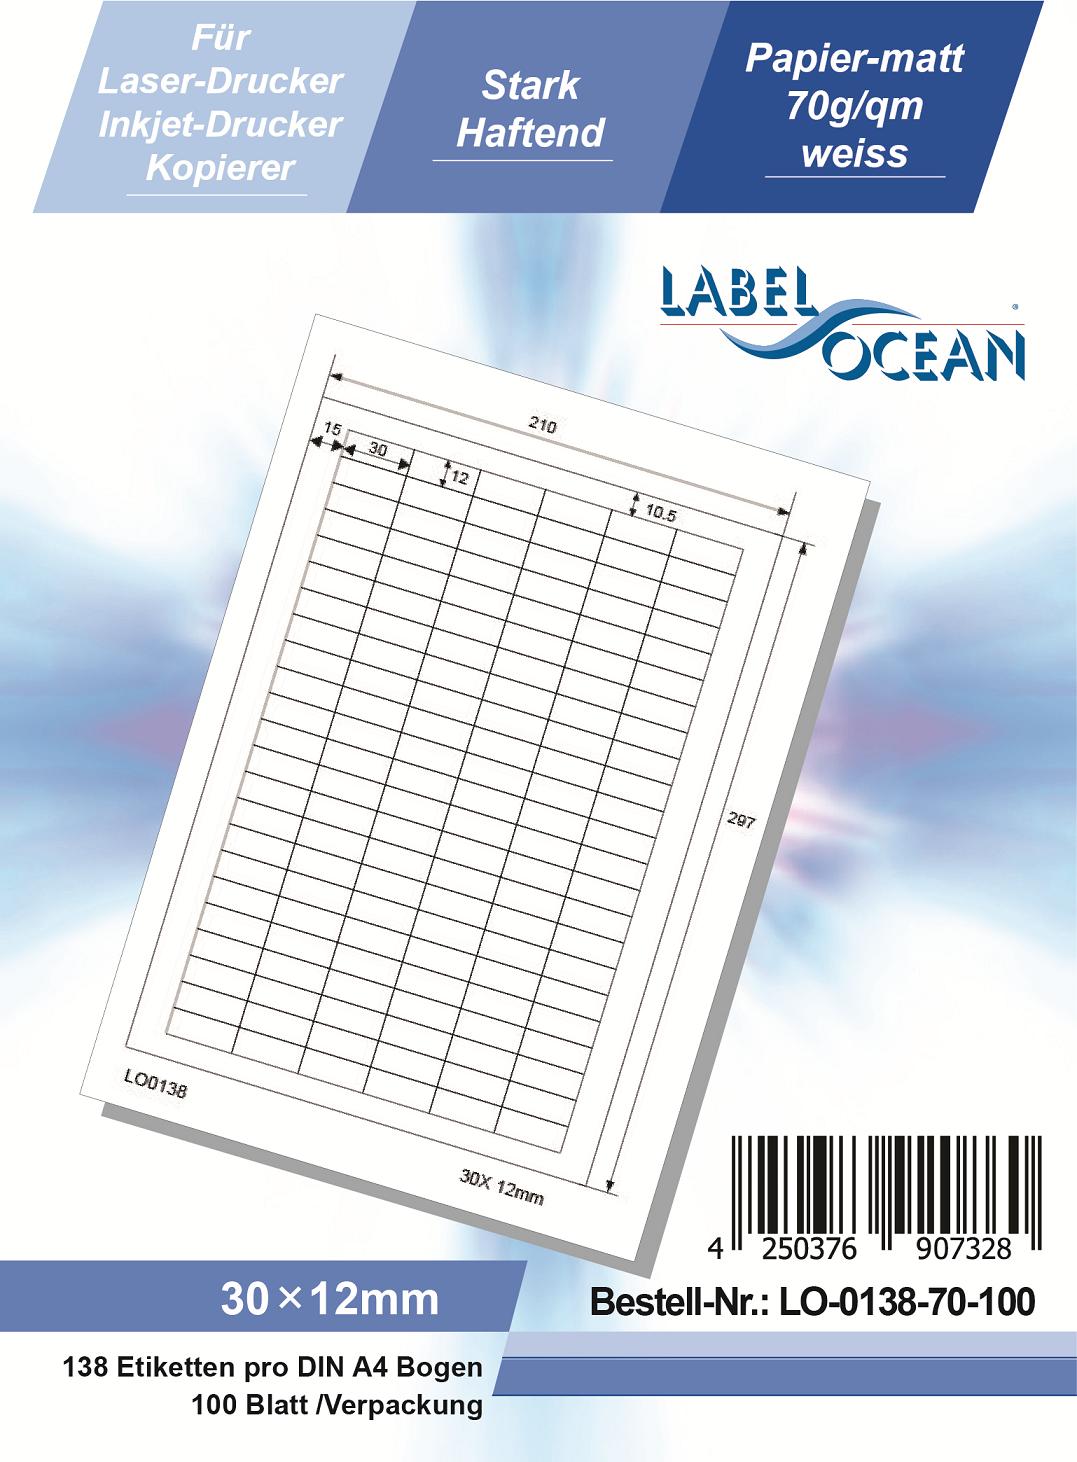 ETIKETTEN 100 Blatt weiß Laser Inkjet Kopierer selbstklebend viele Größen